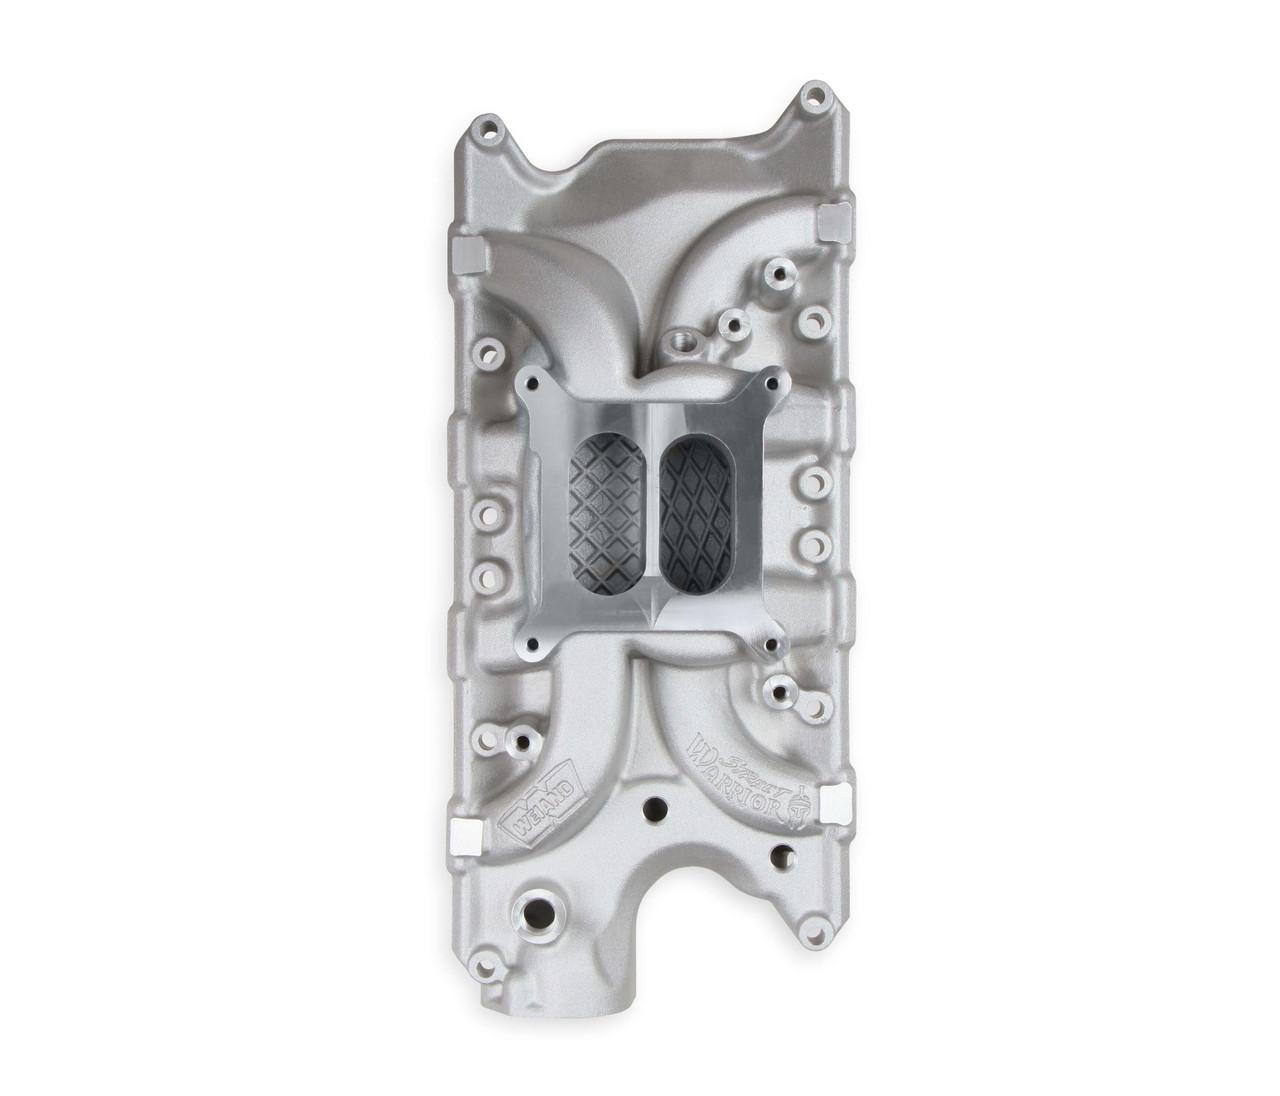 Weiand 8124 Small Block Ford Street Warrior Intake Manifold